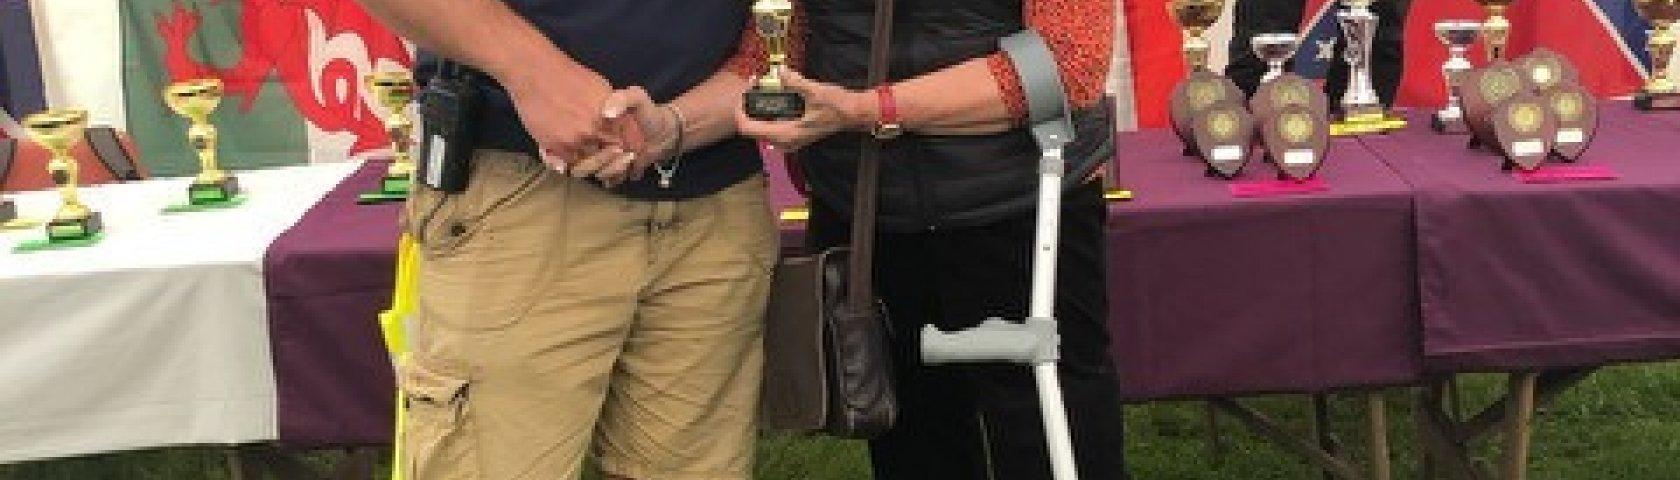 Best Jaguar Saloon Award Presented To Carol Ingram At Tatton Hall In August